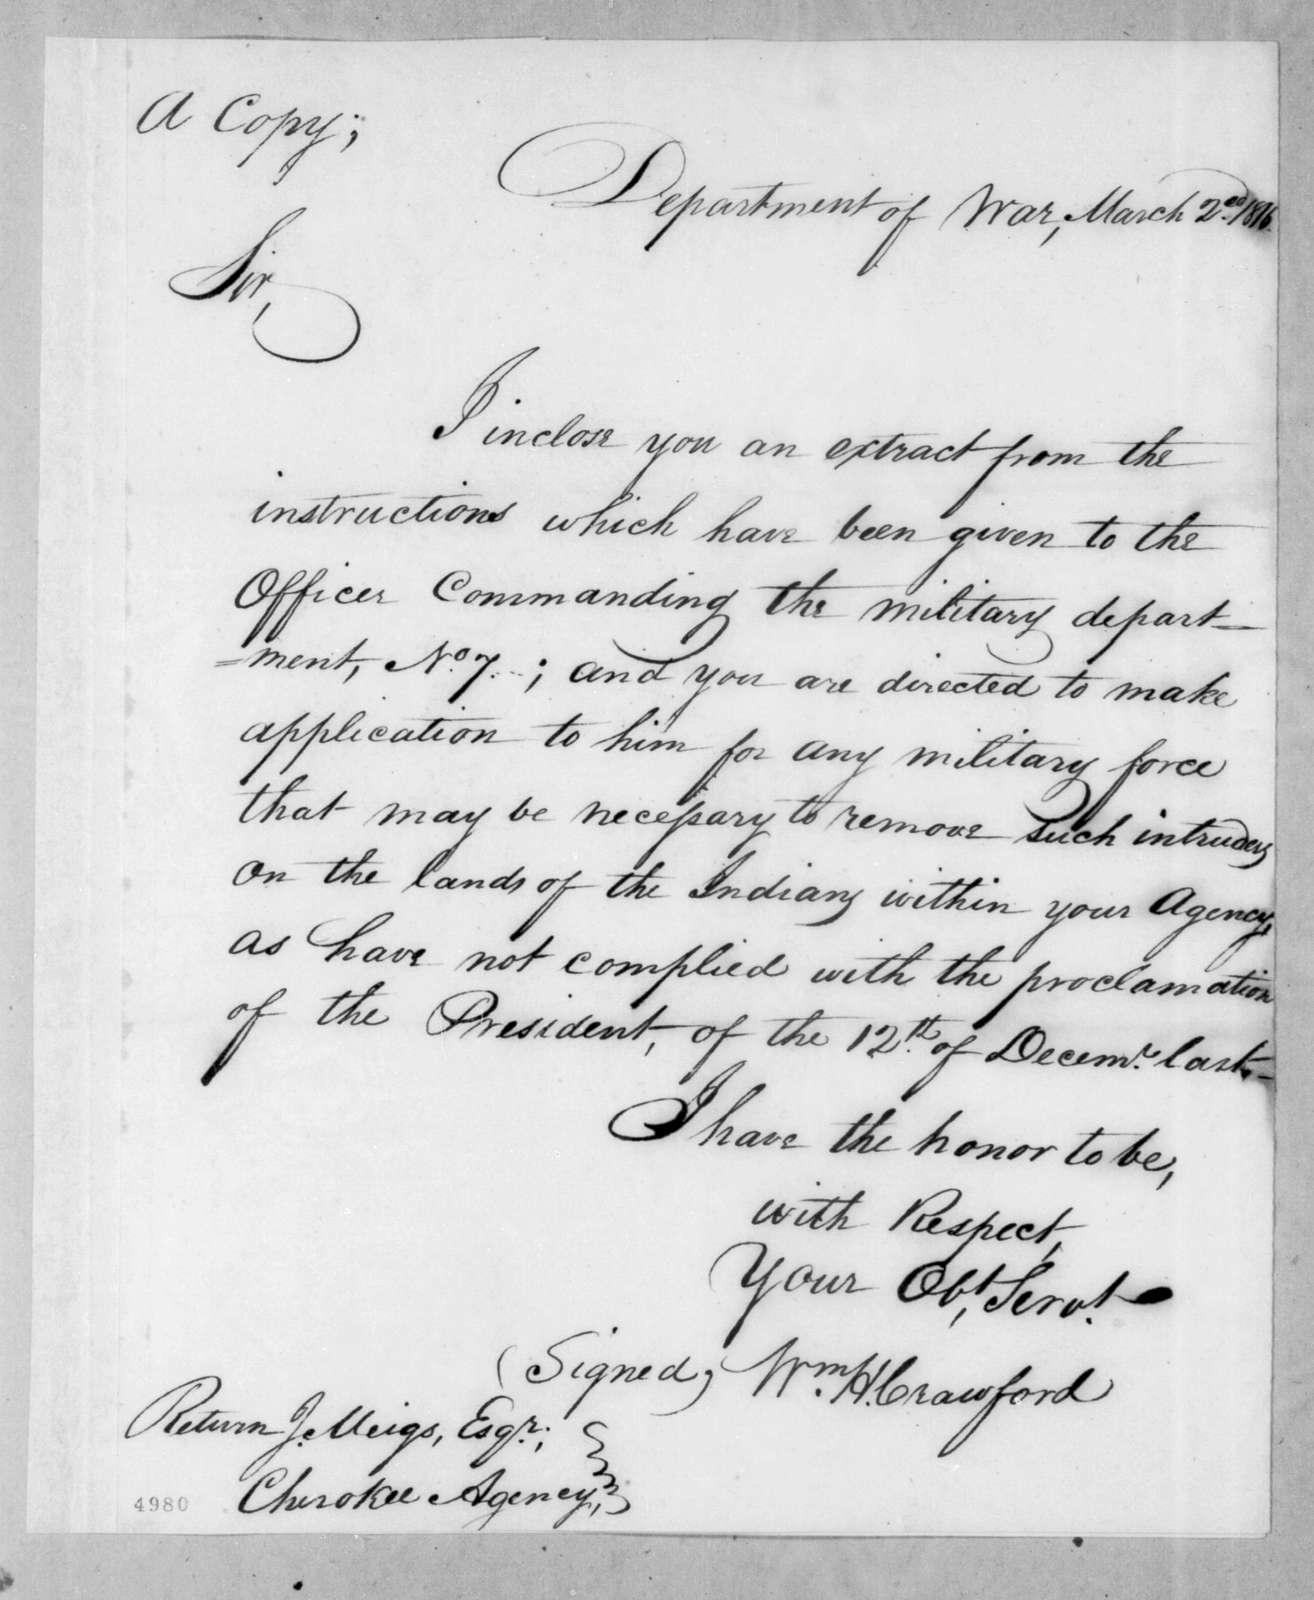 William Harris Crawford to Return Jonathan Meigs, March 2, 1816